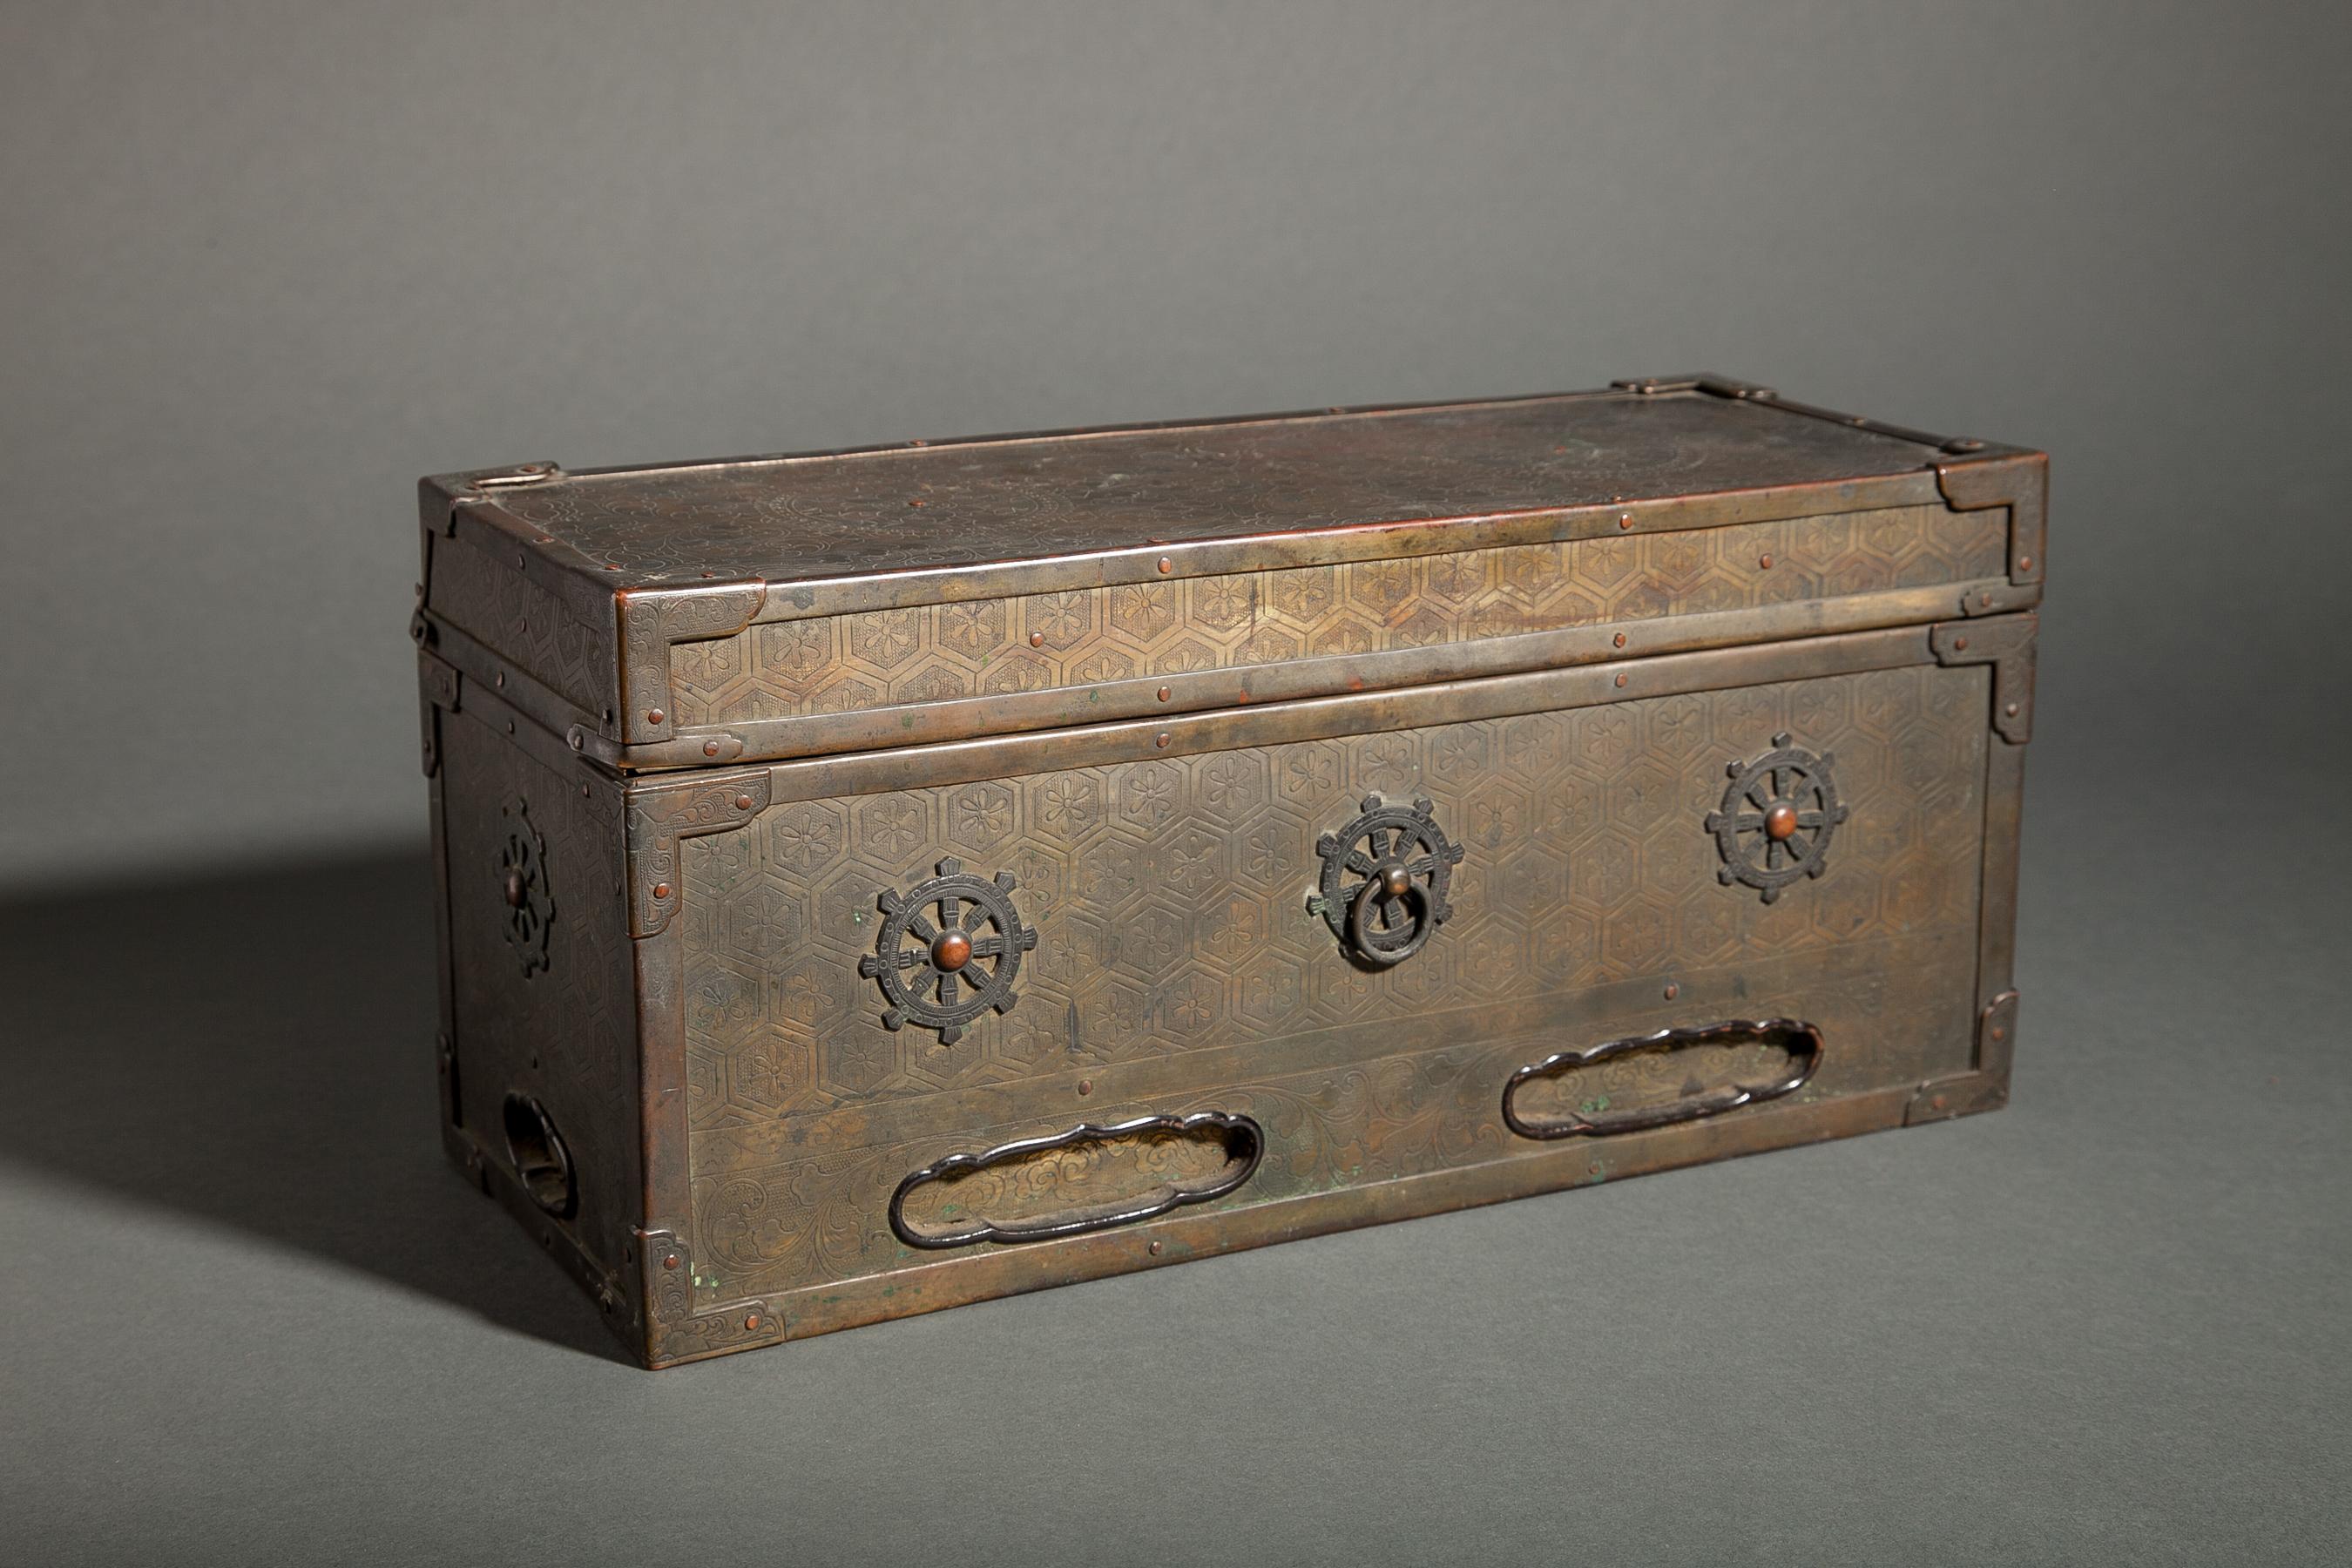 Japanese 16th – 17th Century Bronze Sutra Box